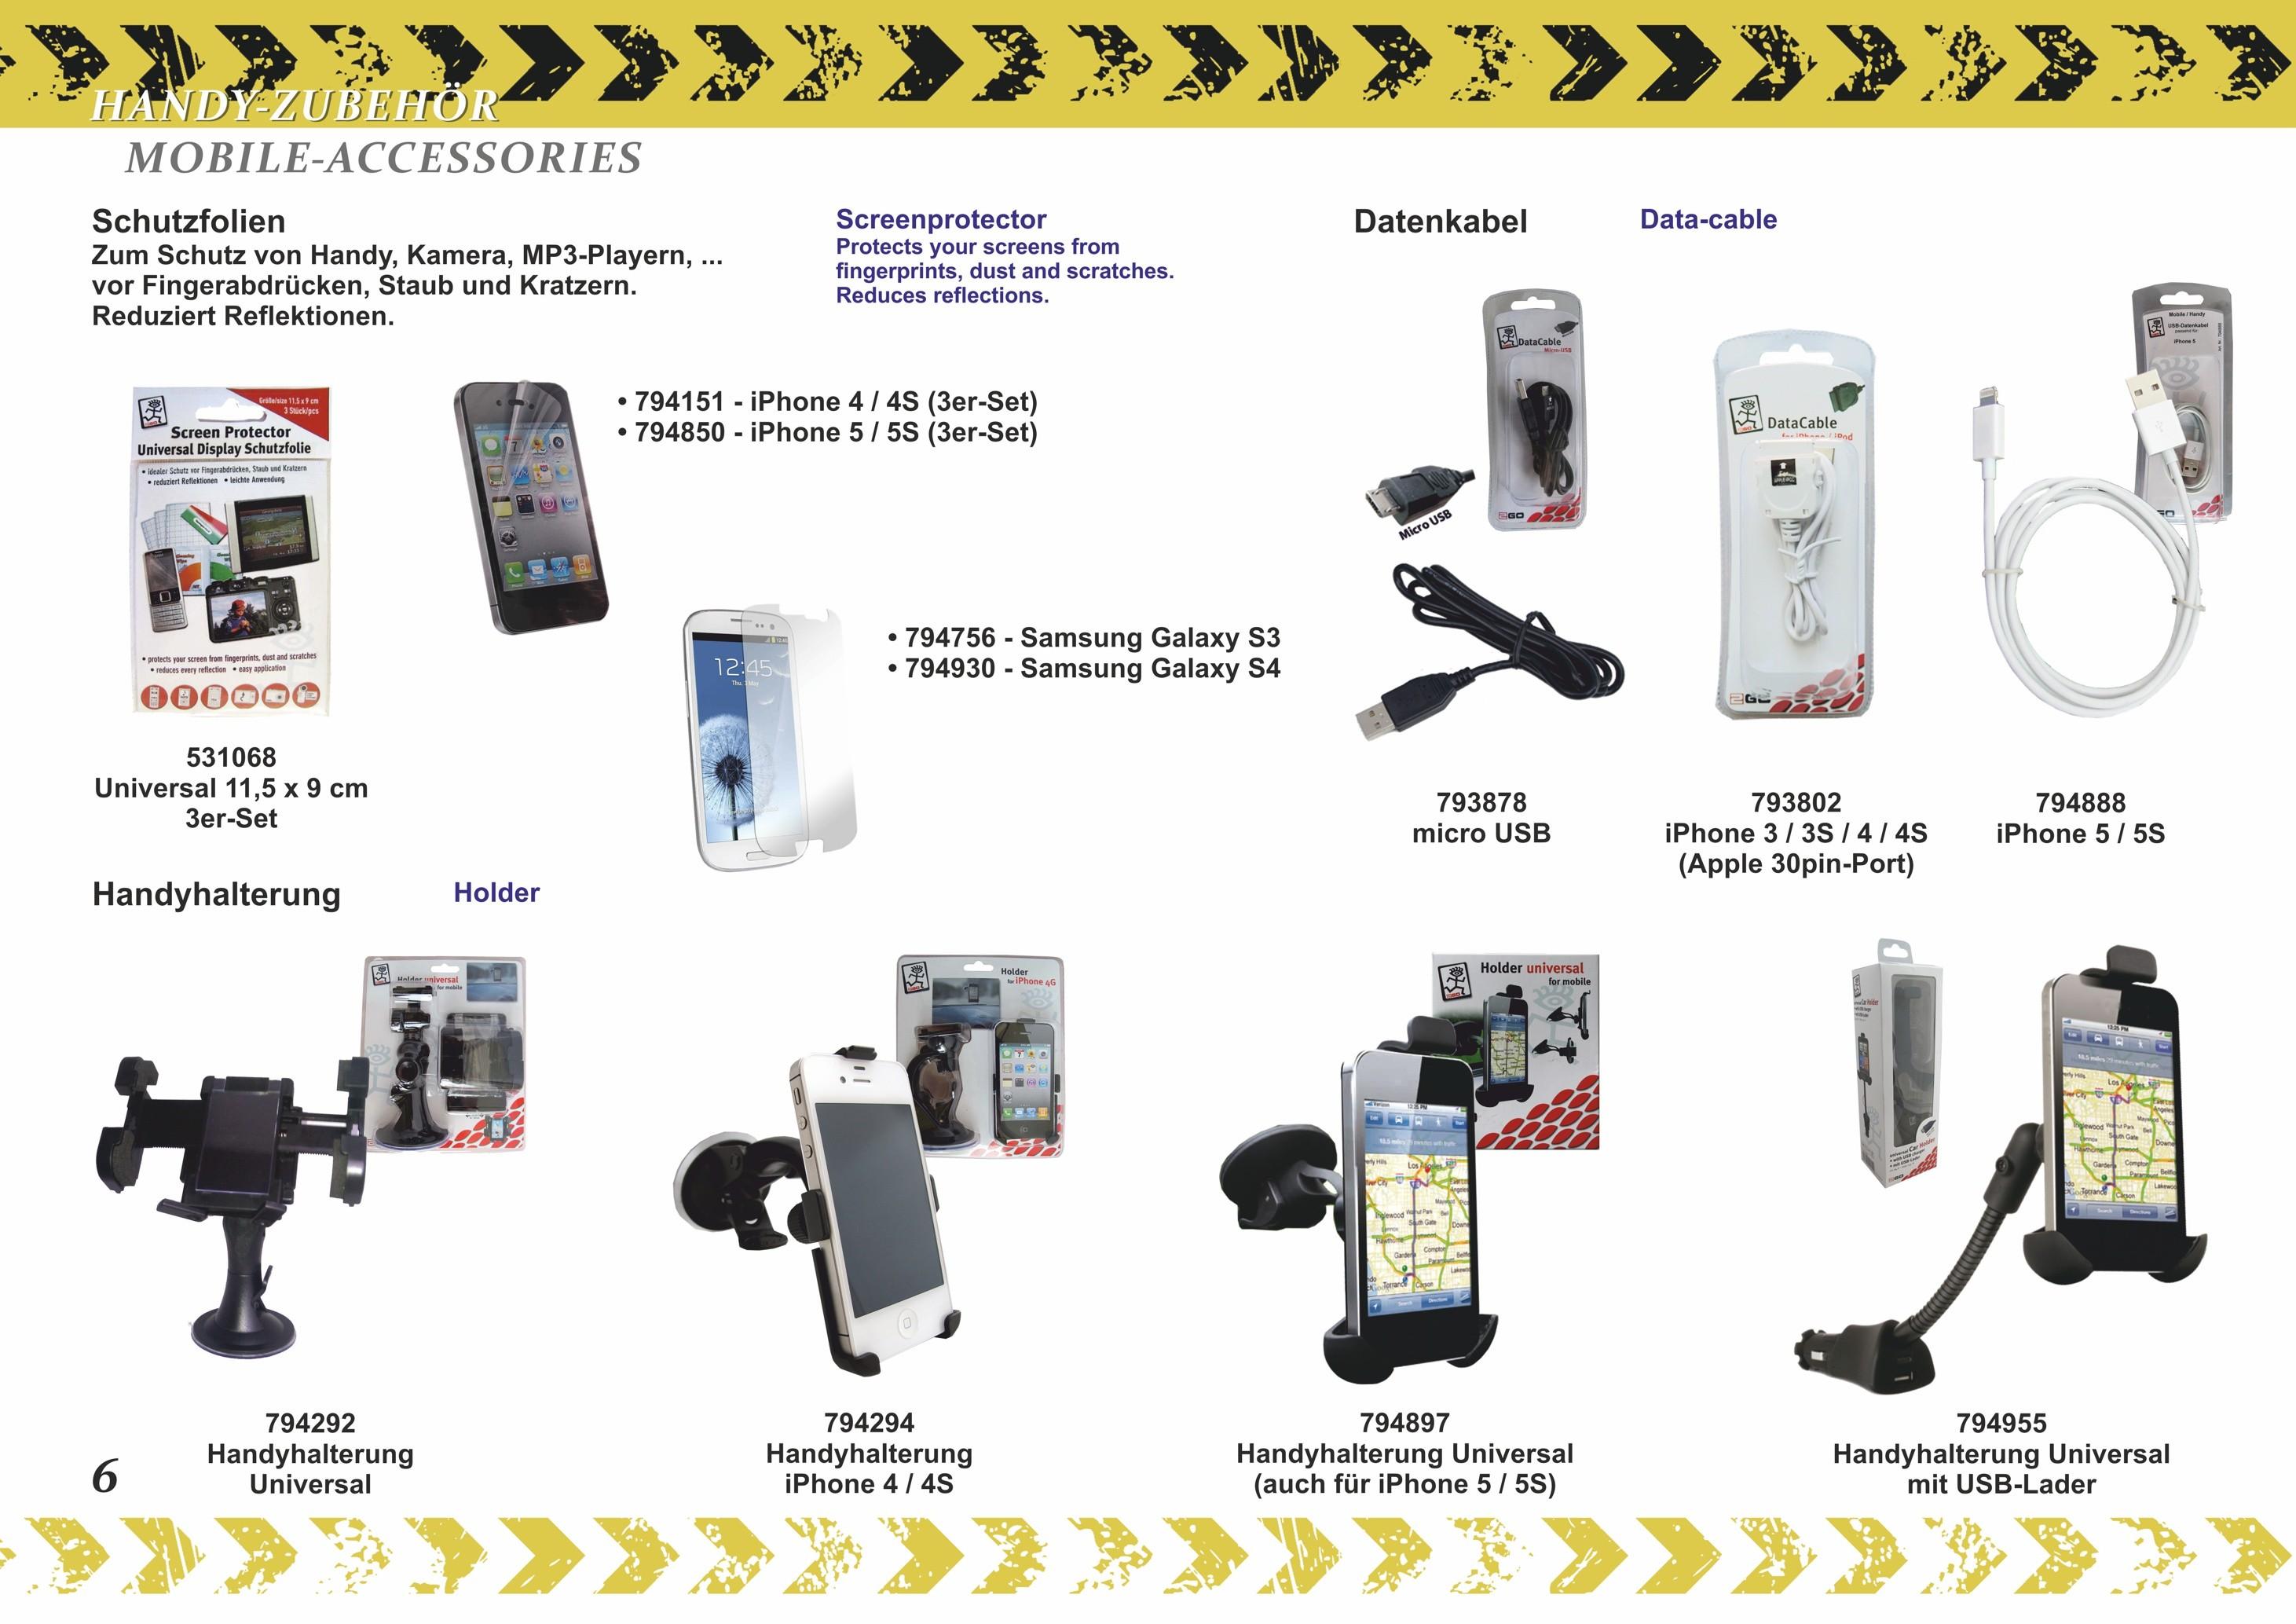 2GO USB-chargeur – Bild 5